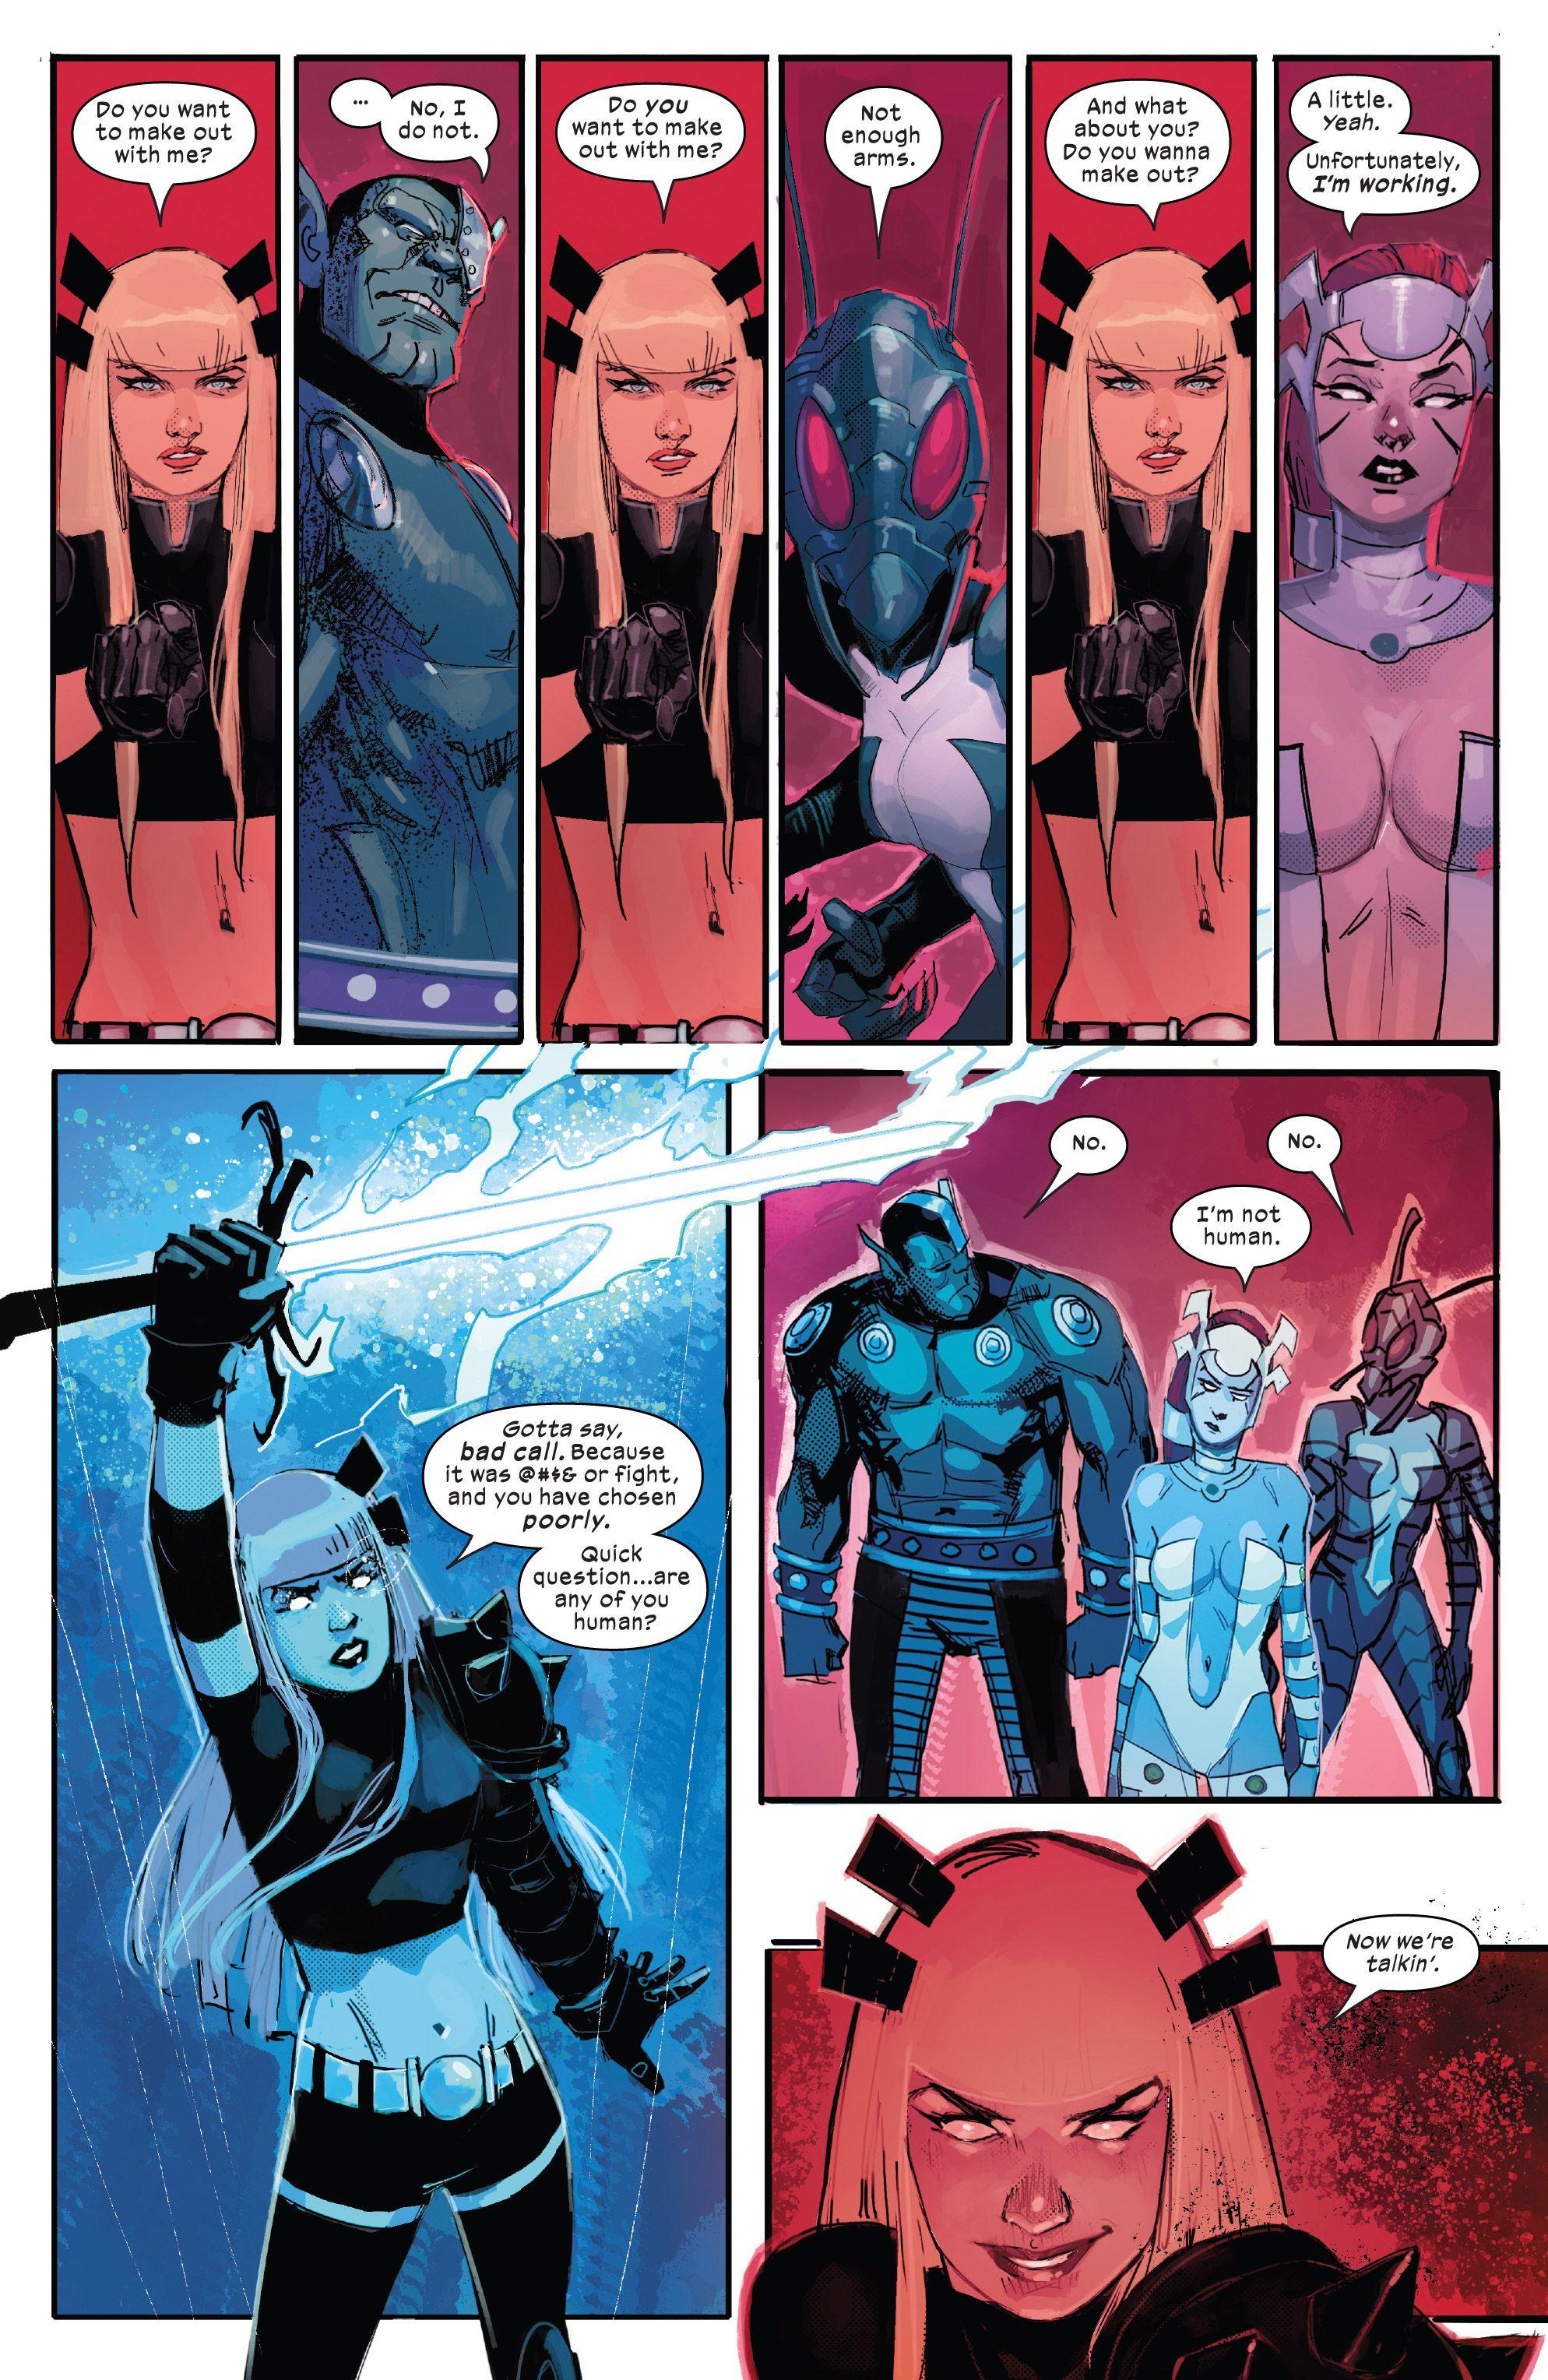 2 New Message In 2020 Superhero Design Xmen Comics Mutant